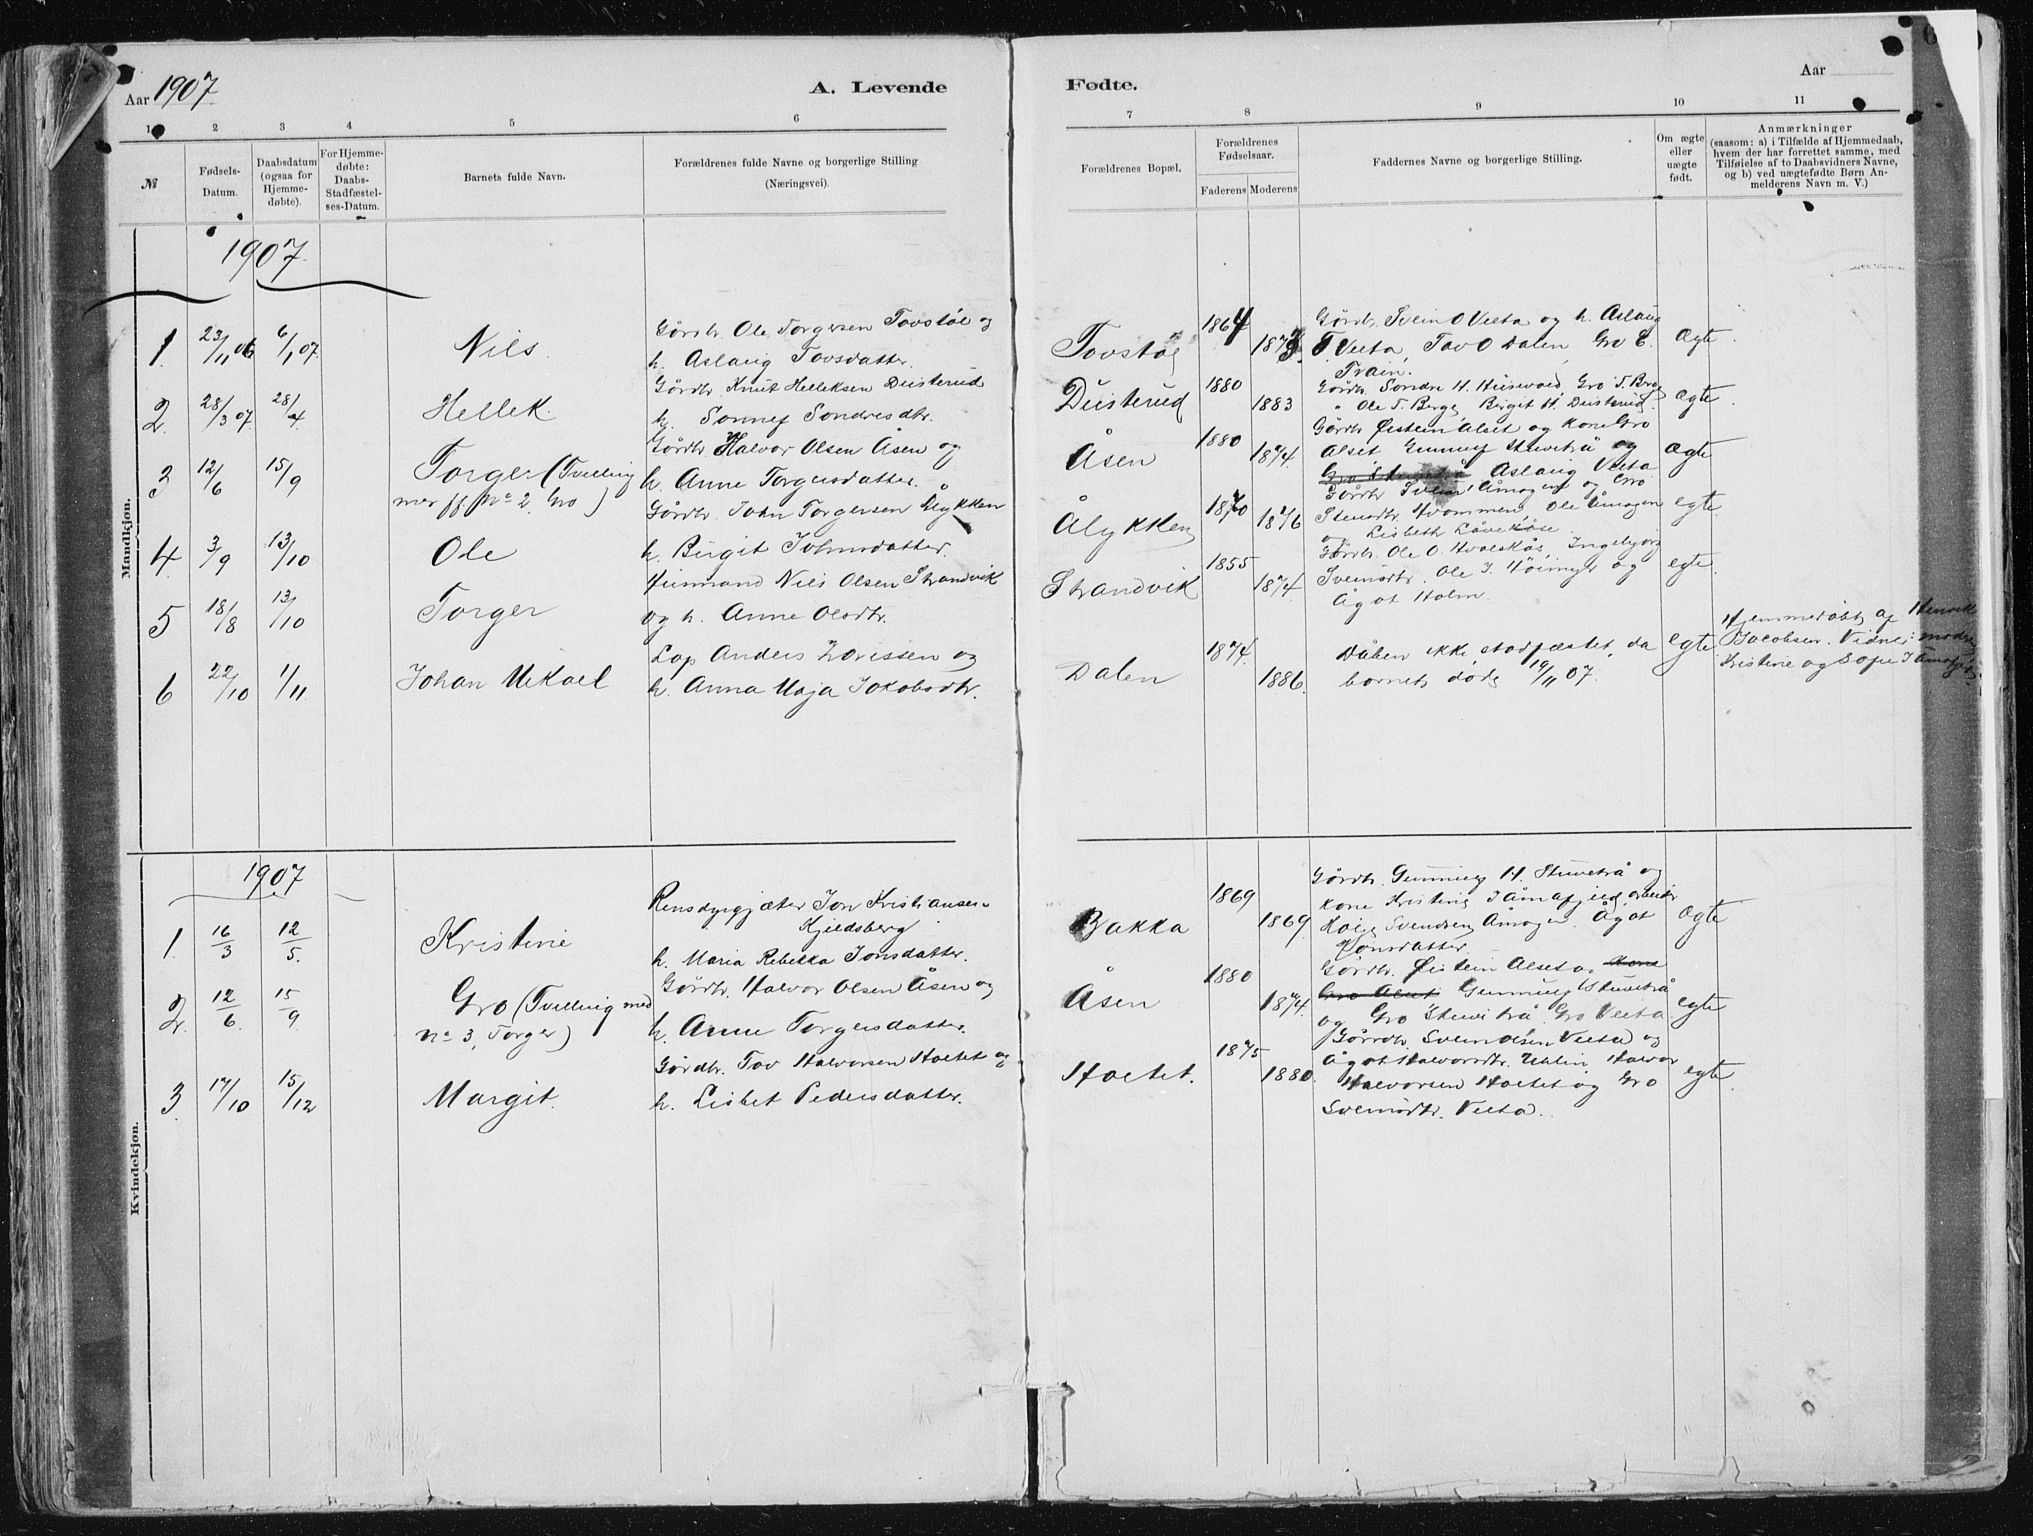 SAKO, Tinn kirkebøker, F/Fa/L0007: Ministerialbok nr. I 7, 1878-1922, s. 68